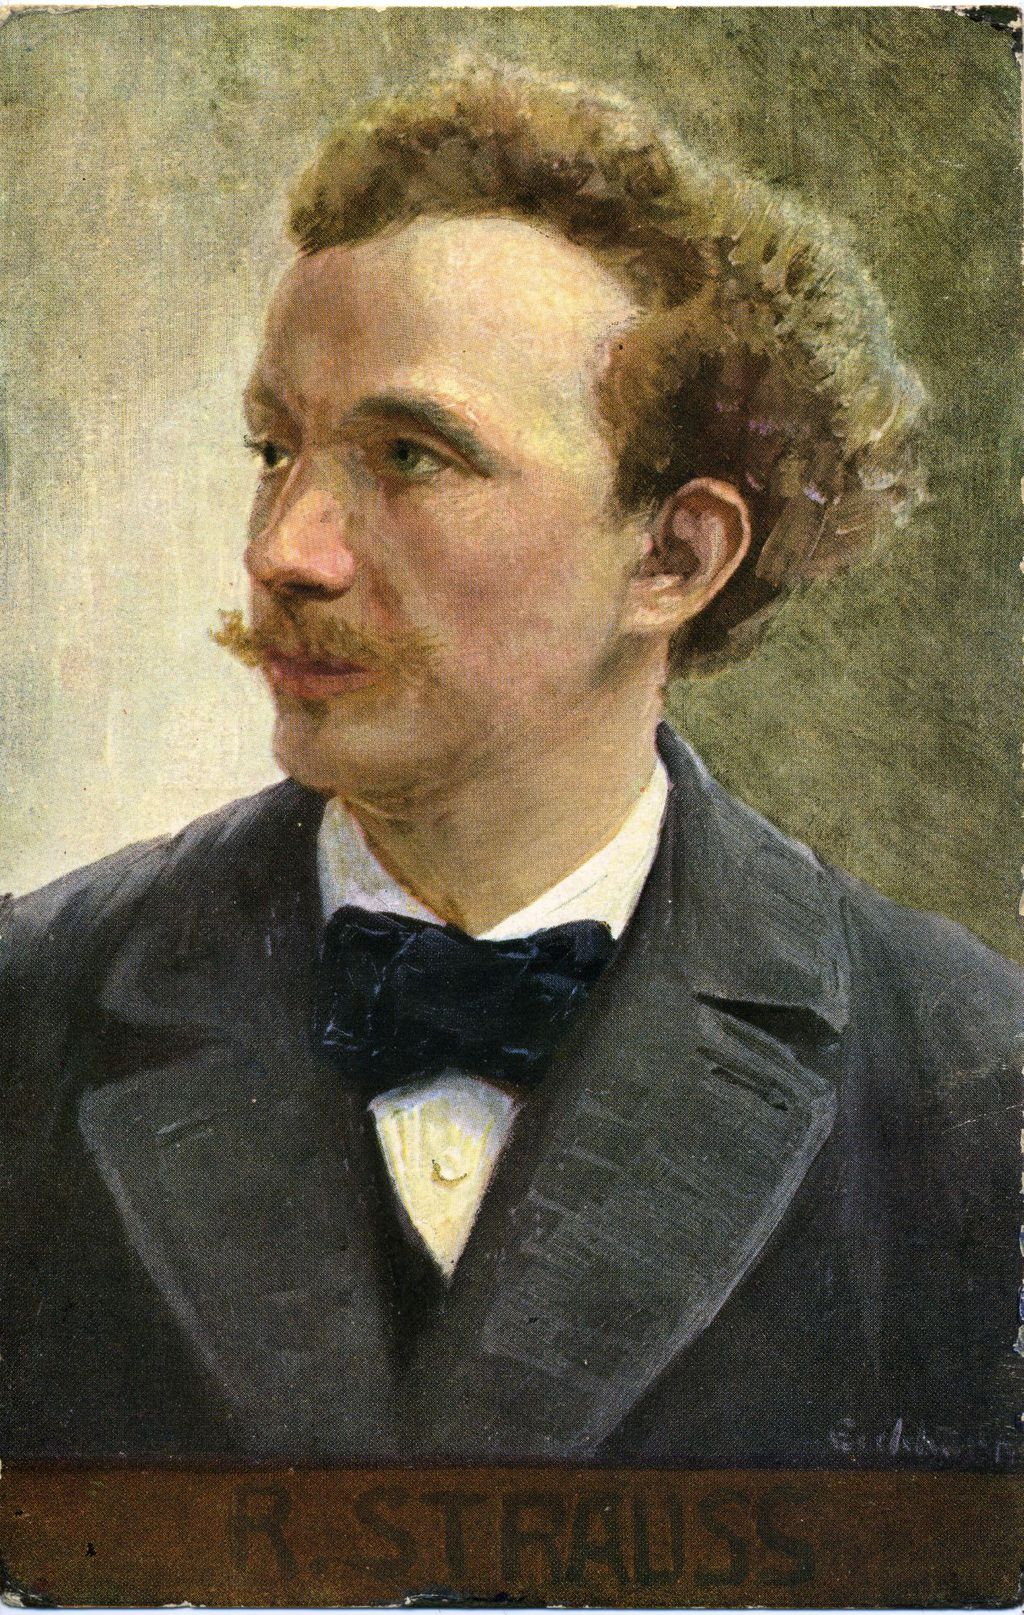 Richard Strauss - The Nash Ensemble Metamorphosen - Piano Quartet